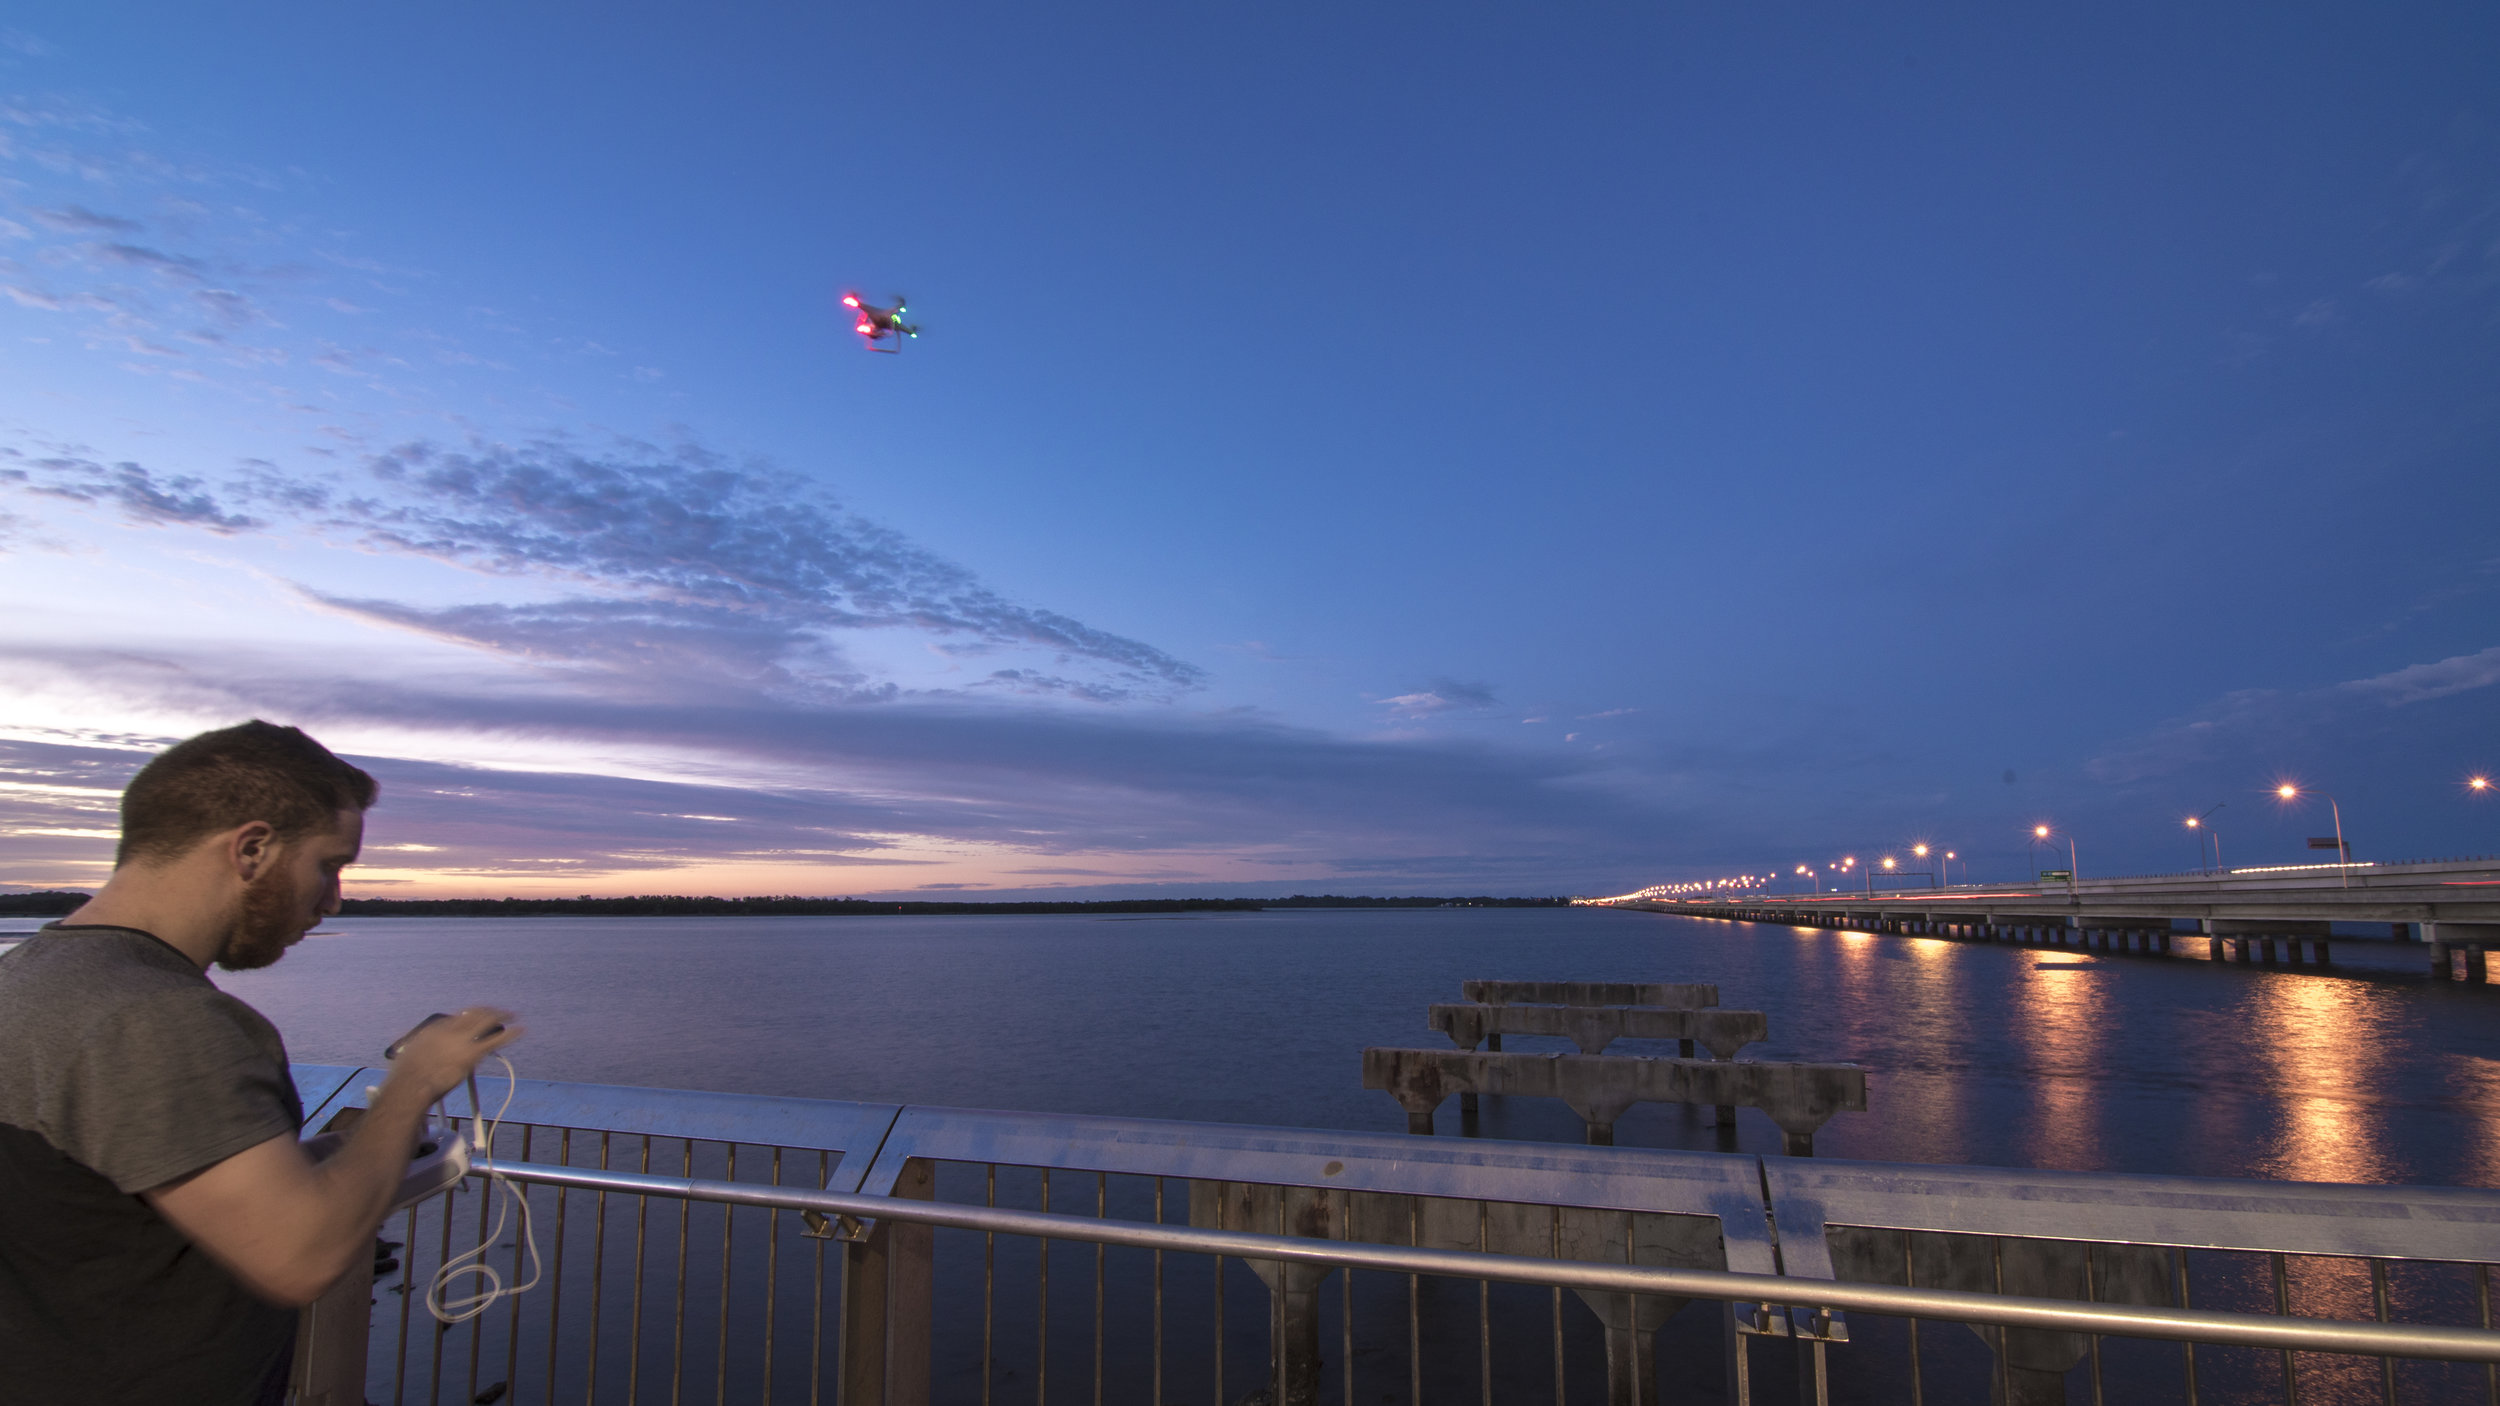 Welcome   Tech Philosophy - Aerial Photography   BLOG   PORTFOLIO